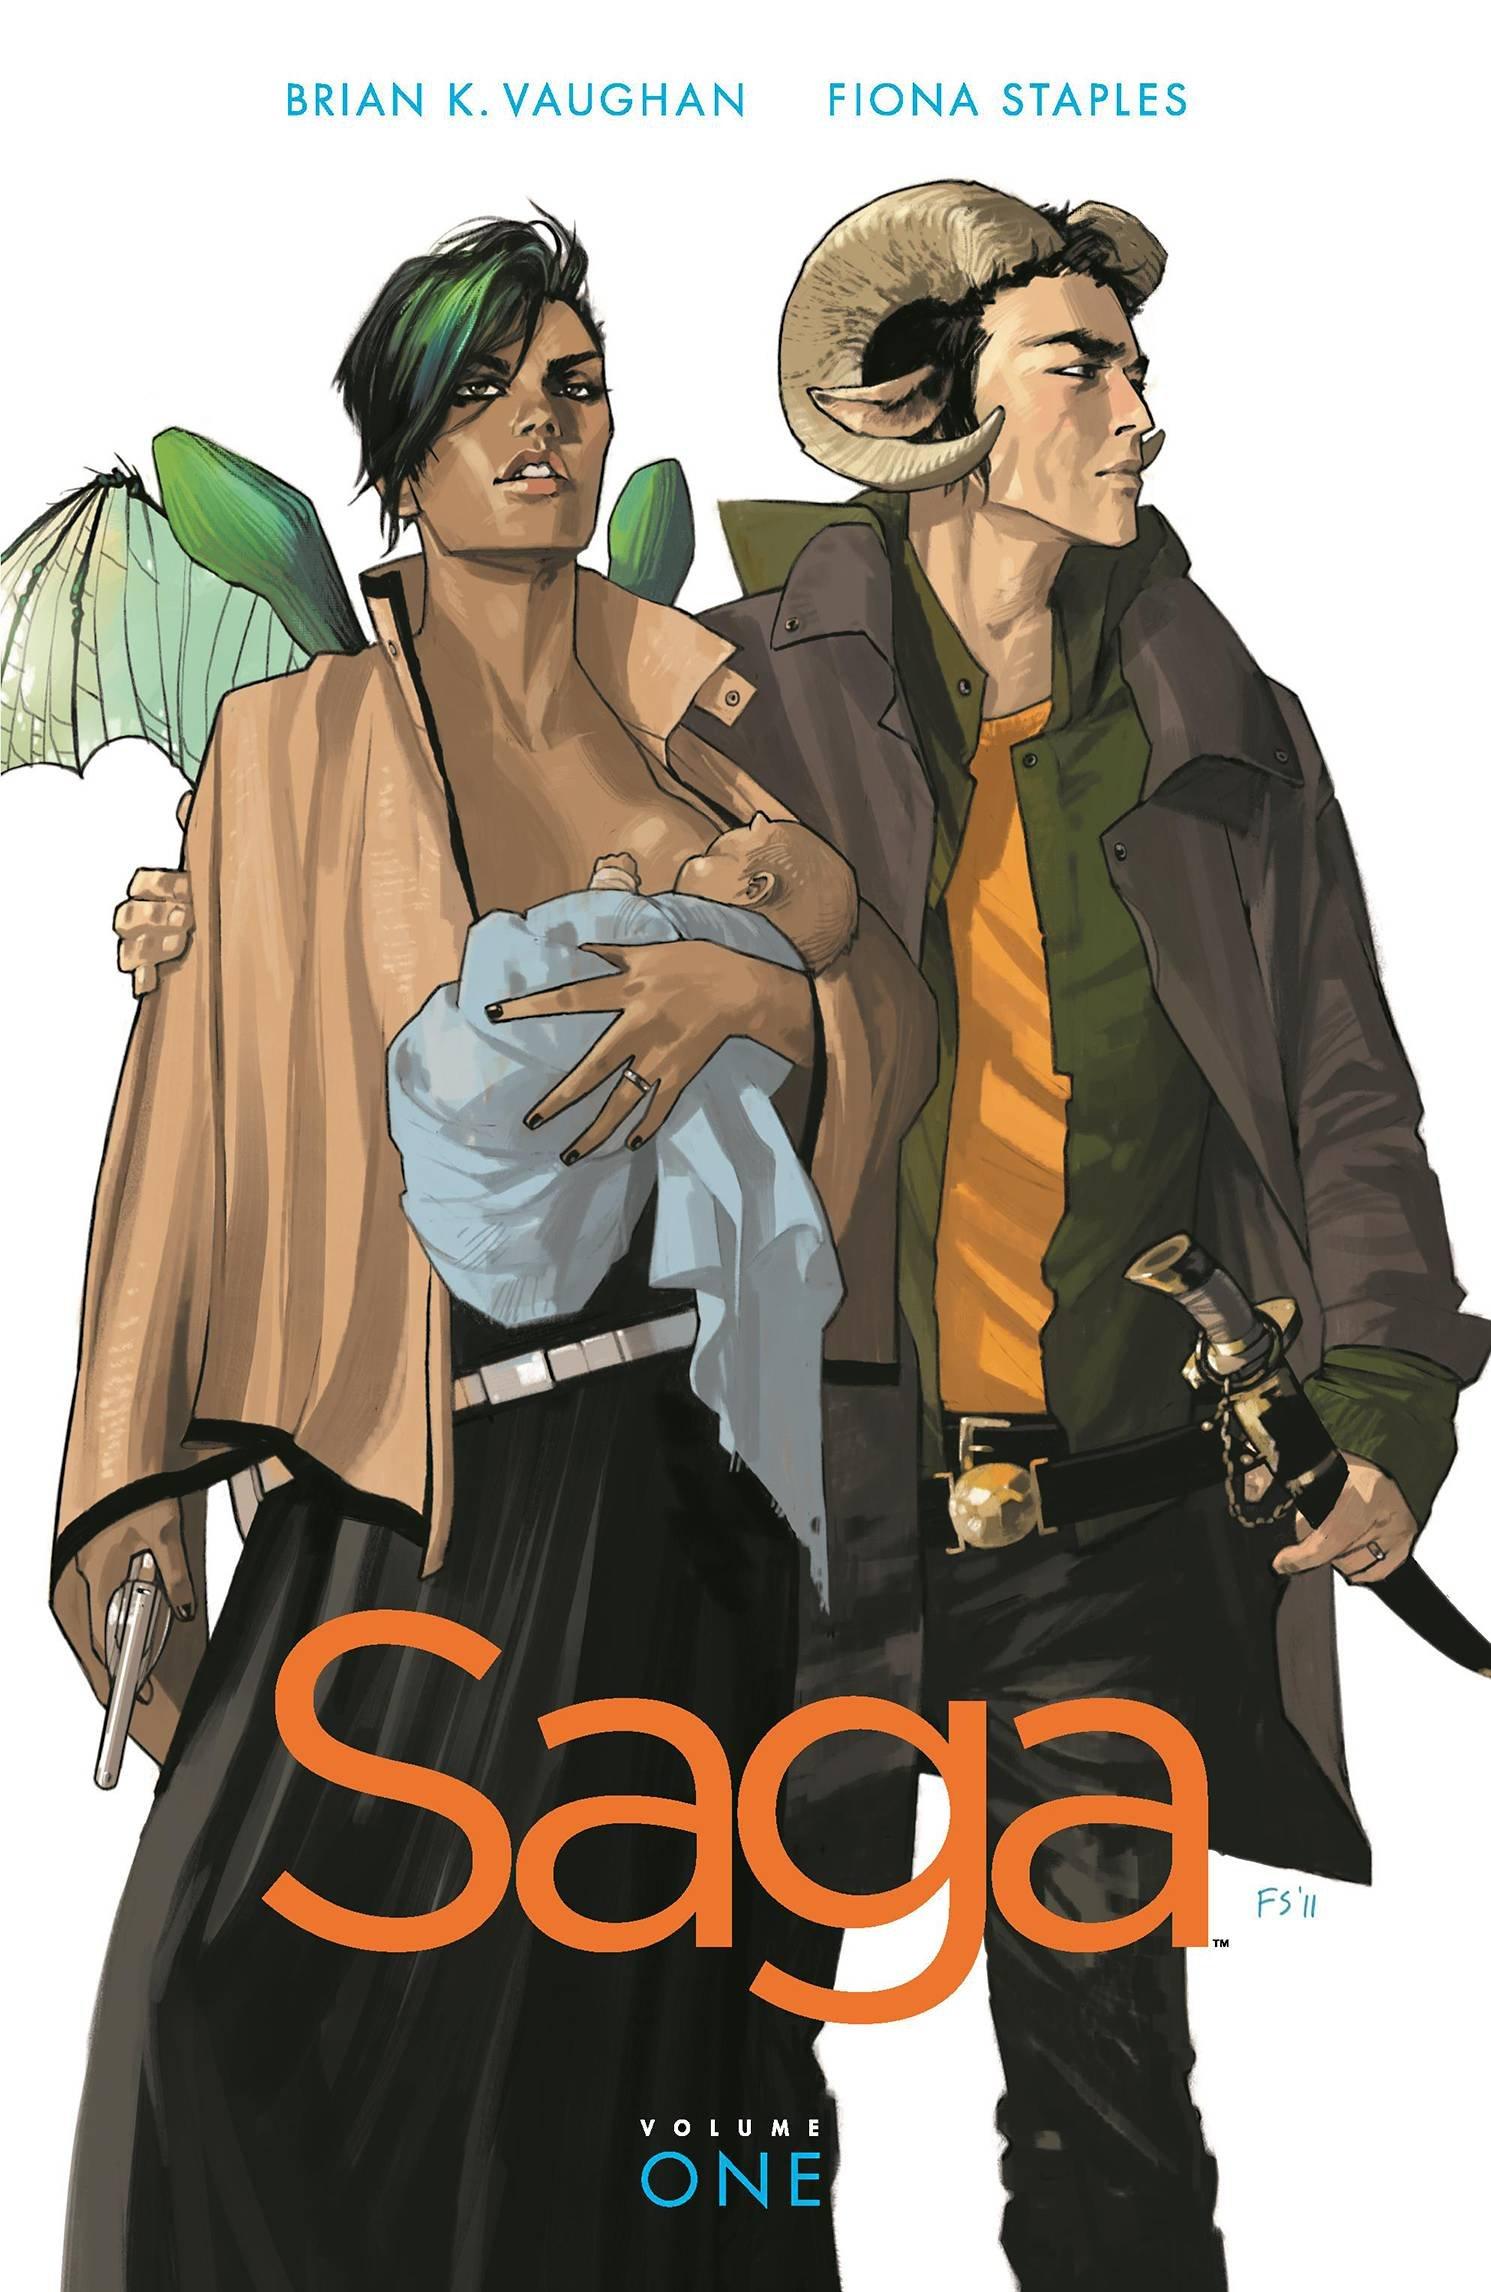 SAGA TP 1: Amazon.es: VAUGHAN, BRIAN K, STAPLES, FIONA: Libros en idiomas extranjeros